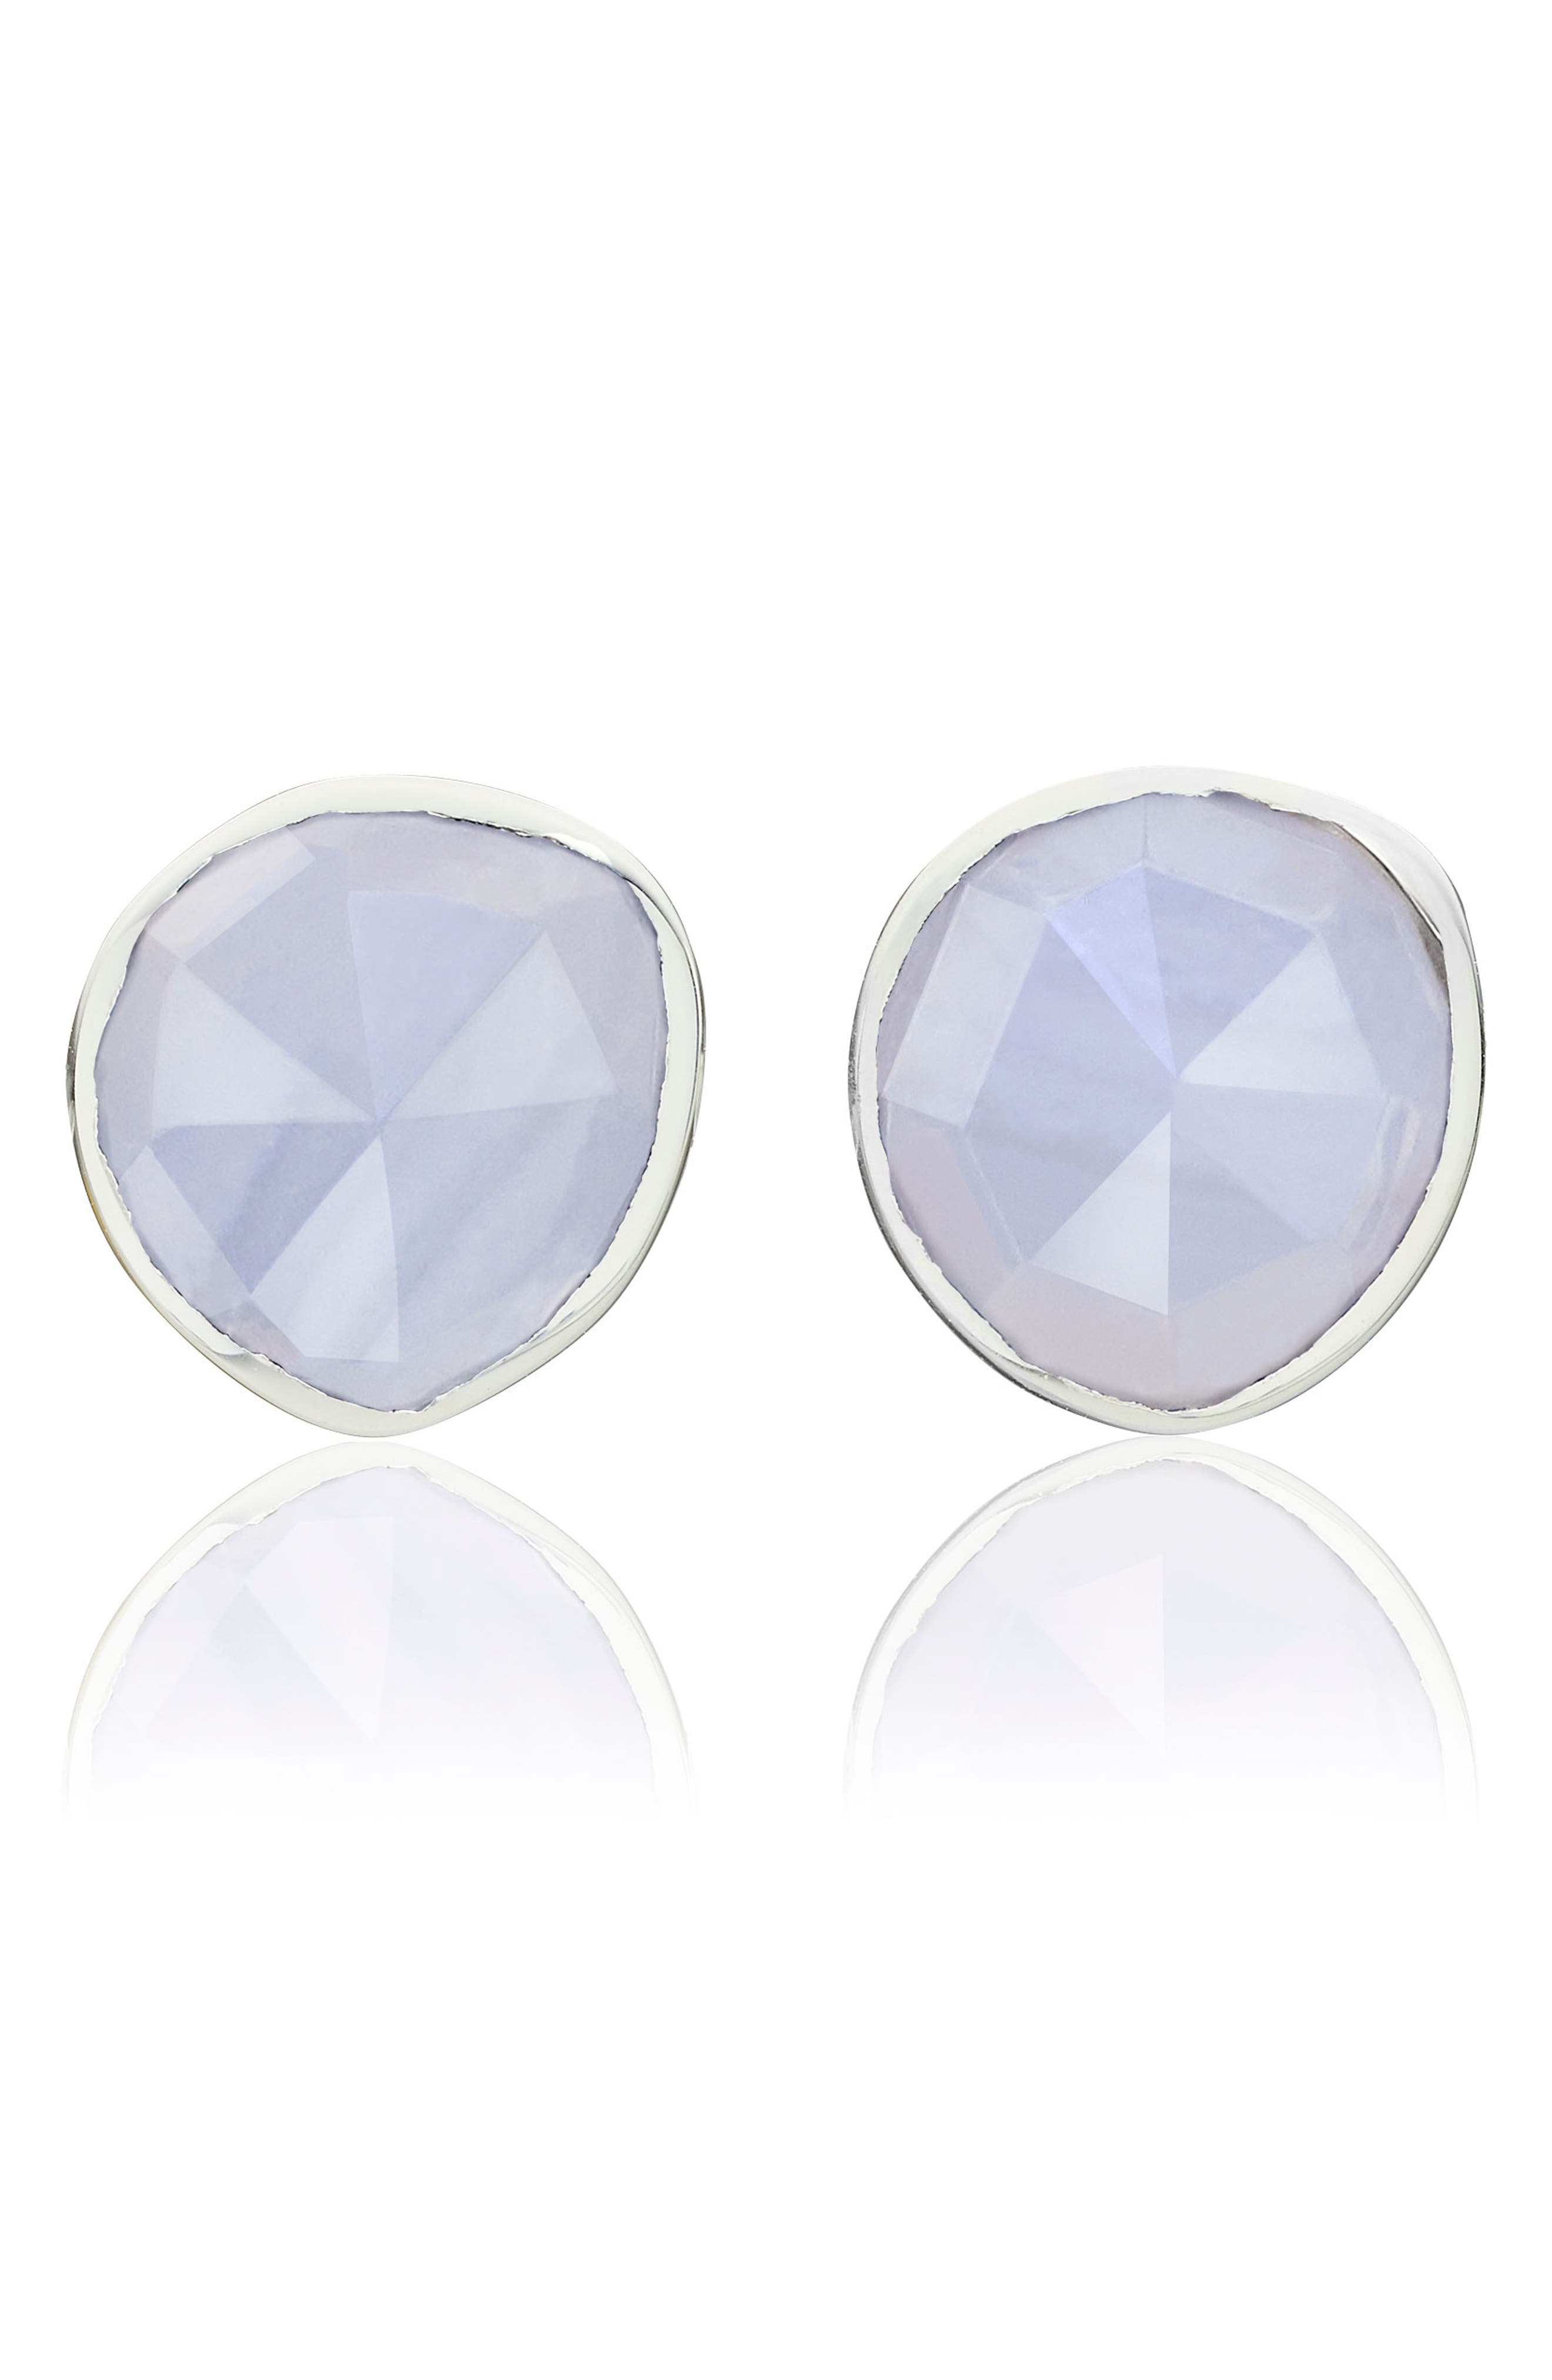 Siren Stud Earrings,                             Main thumbnail 1, color,                             Silver/ Blue Lace Agate